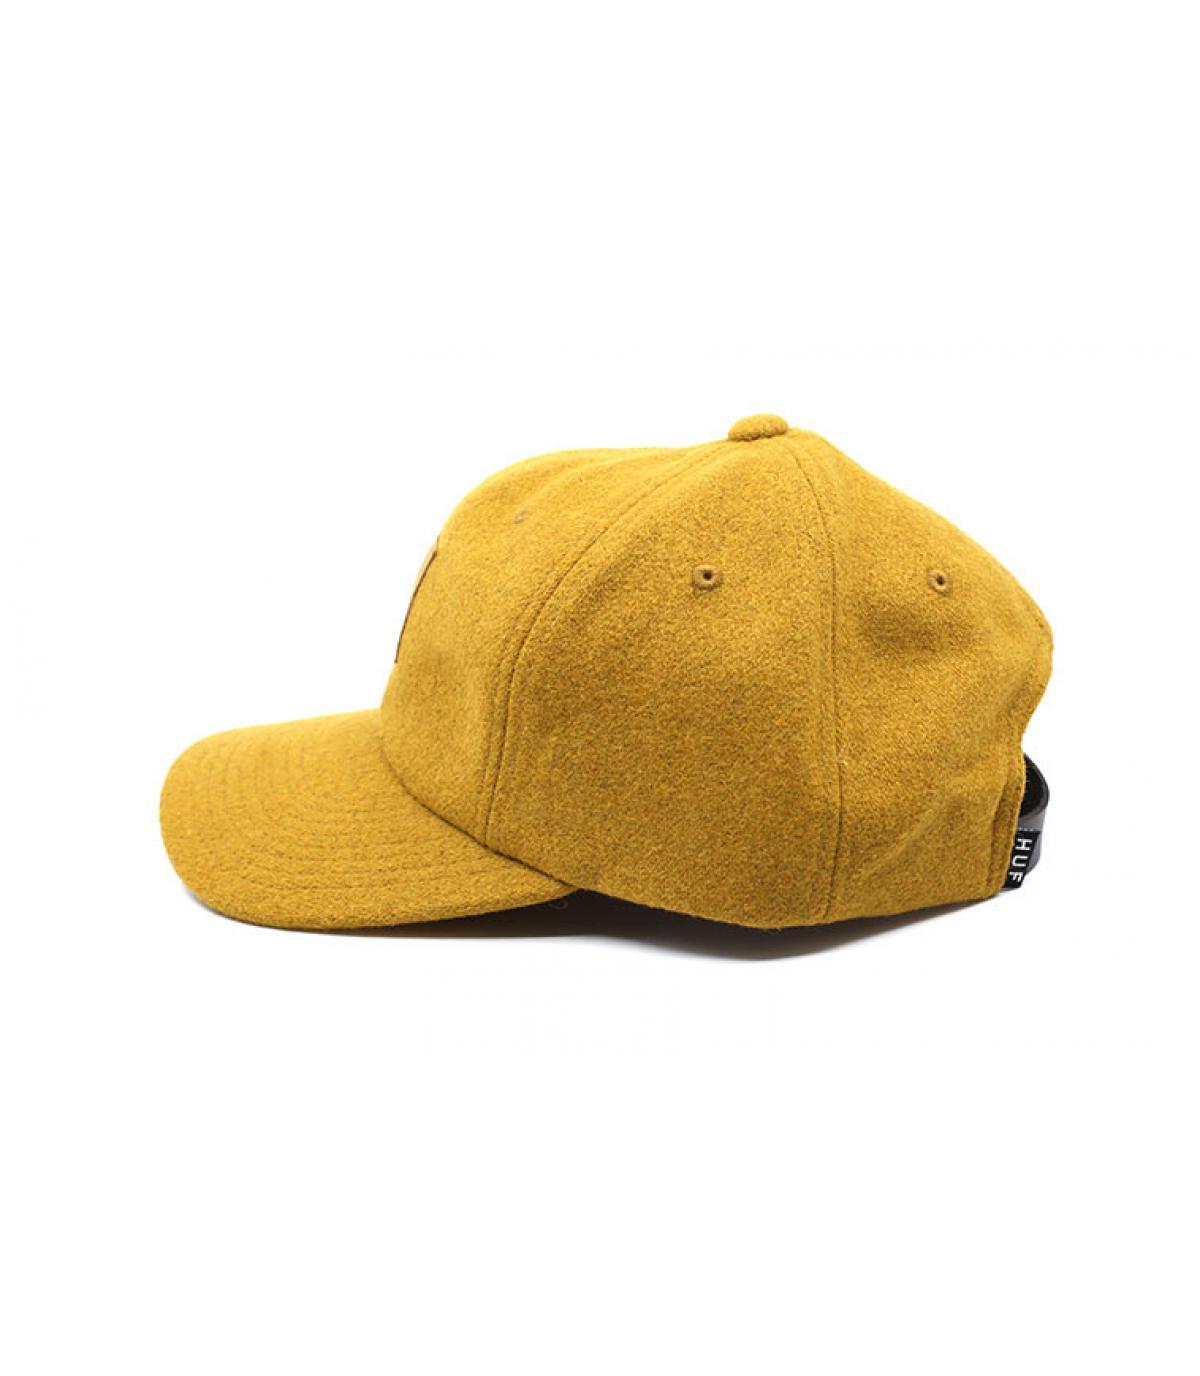 Détails Wool Box Logo mustard - image 4